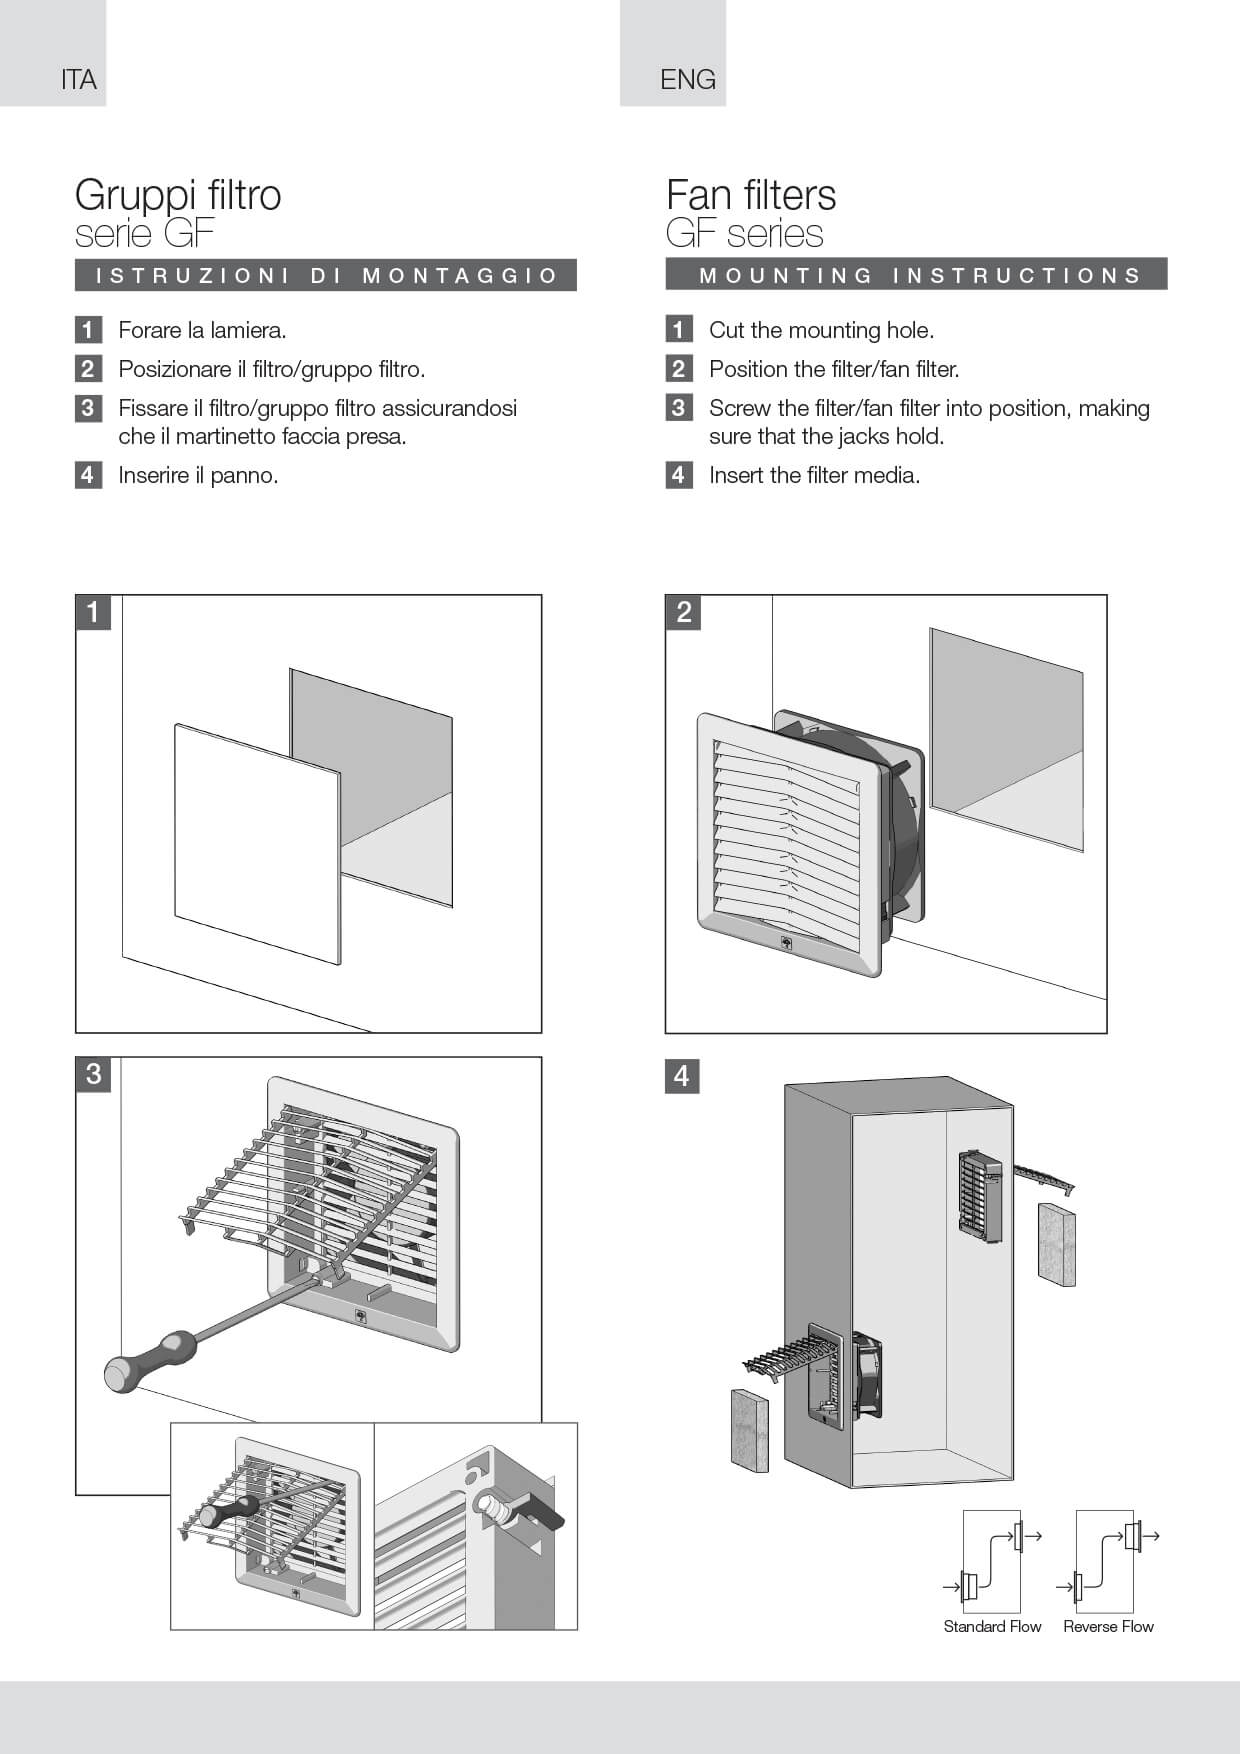 Filter fans GF instructions